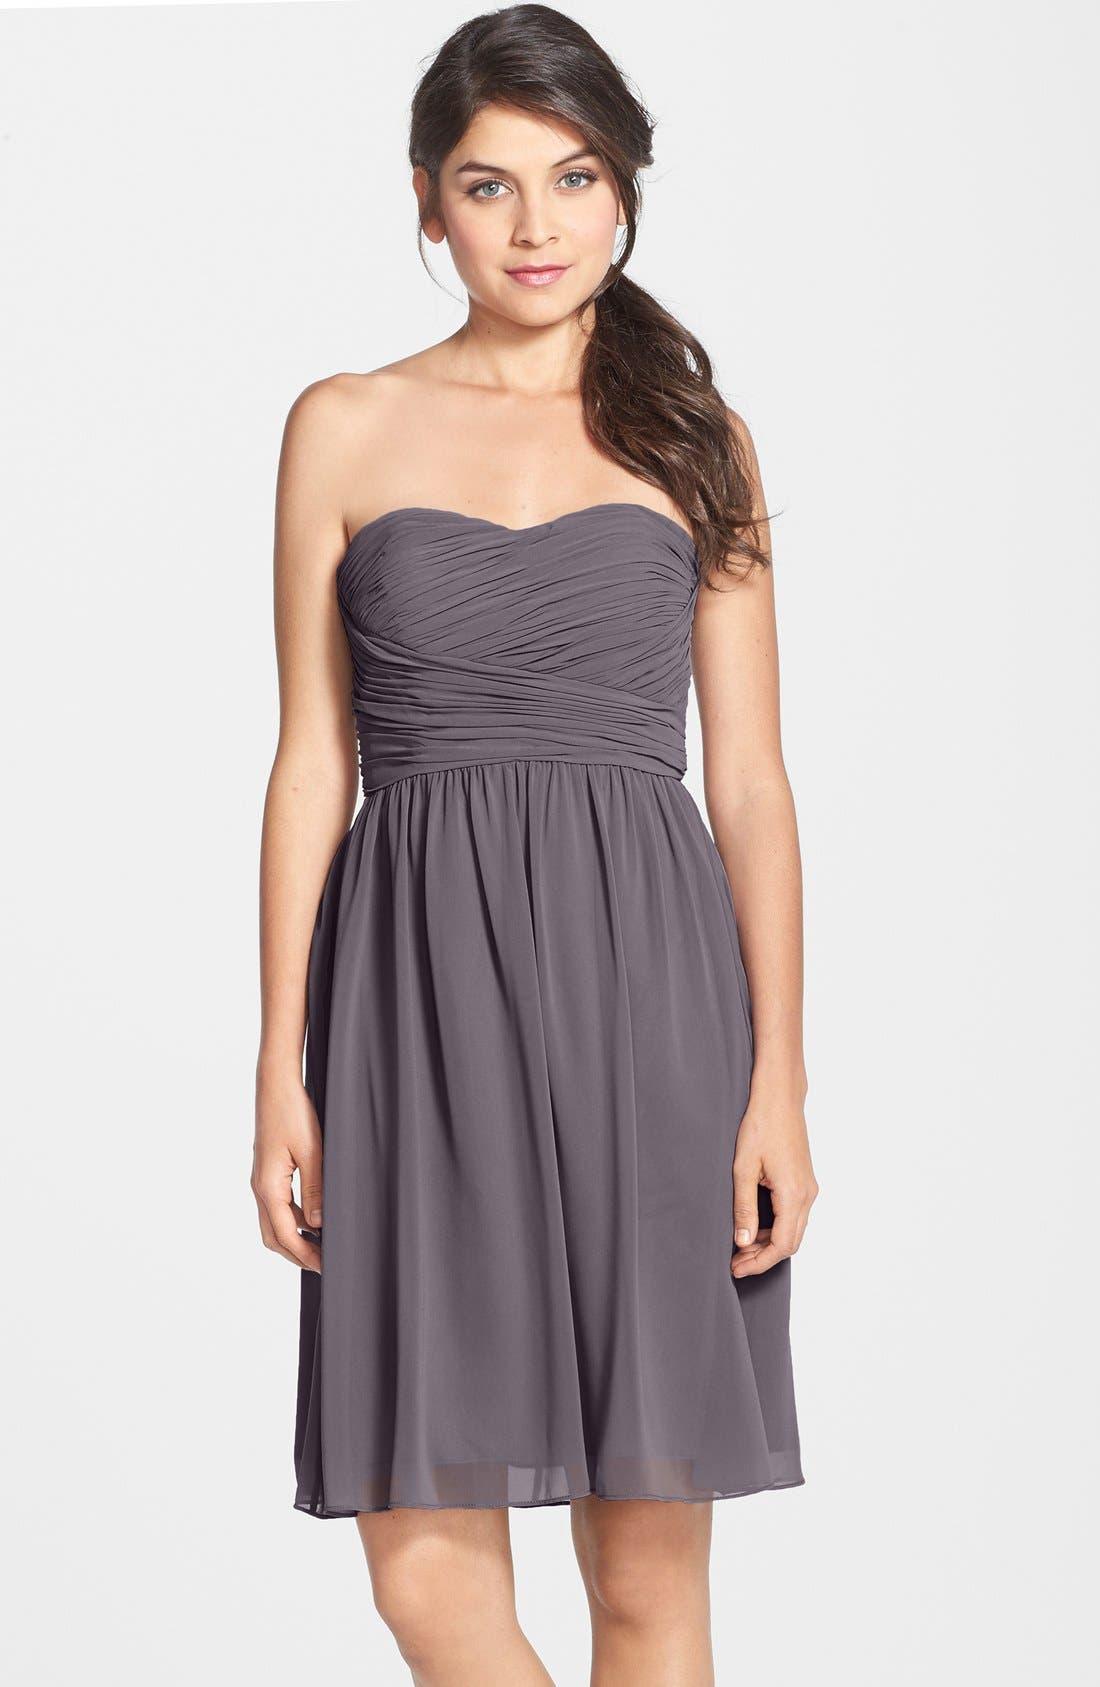 Alternate Image 1 Selected - Donna Morgan 'Sarah' Strapless Ruched Chiffon Dress